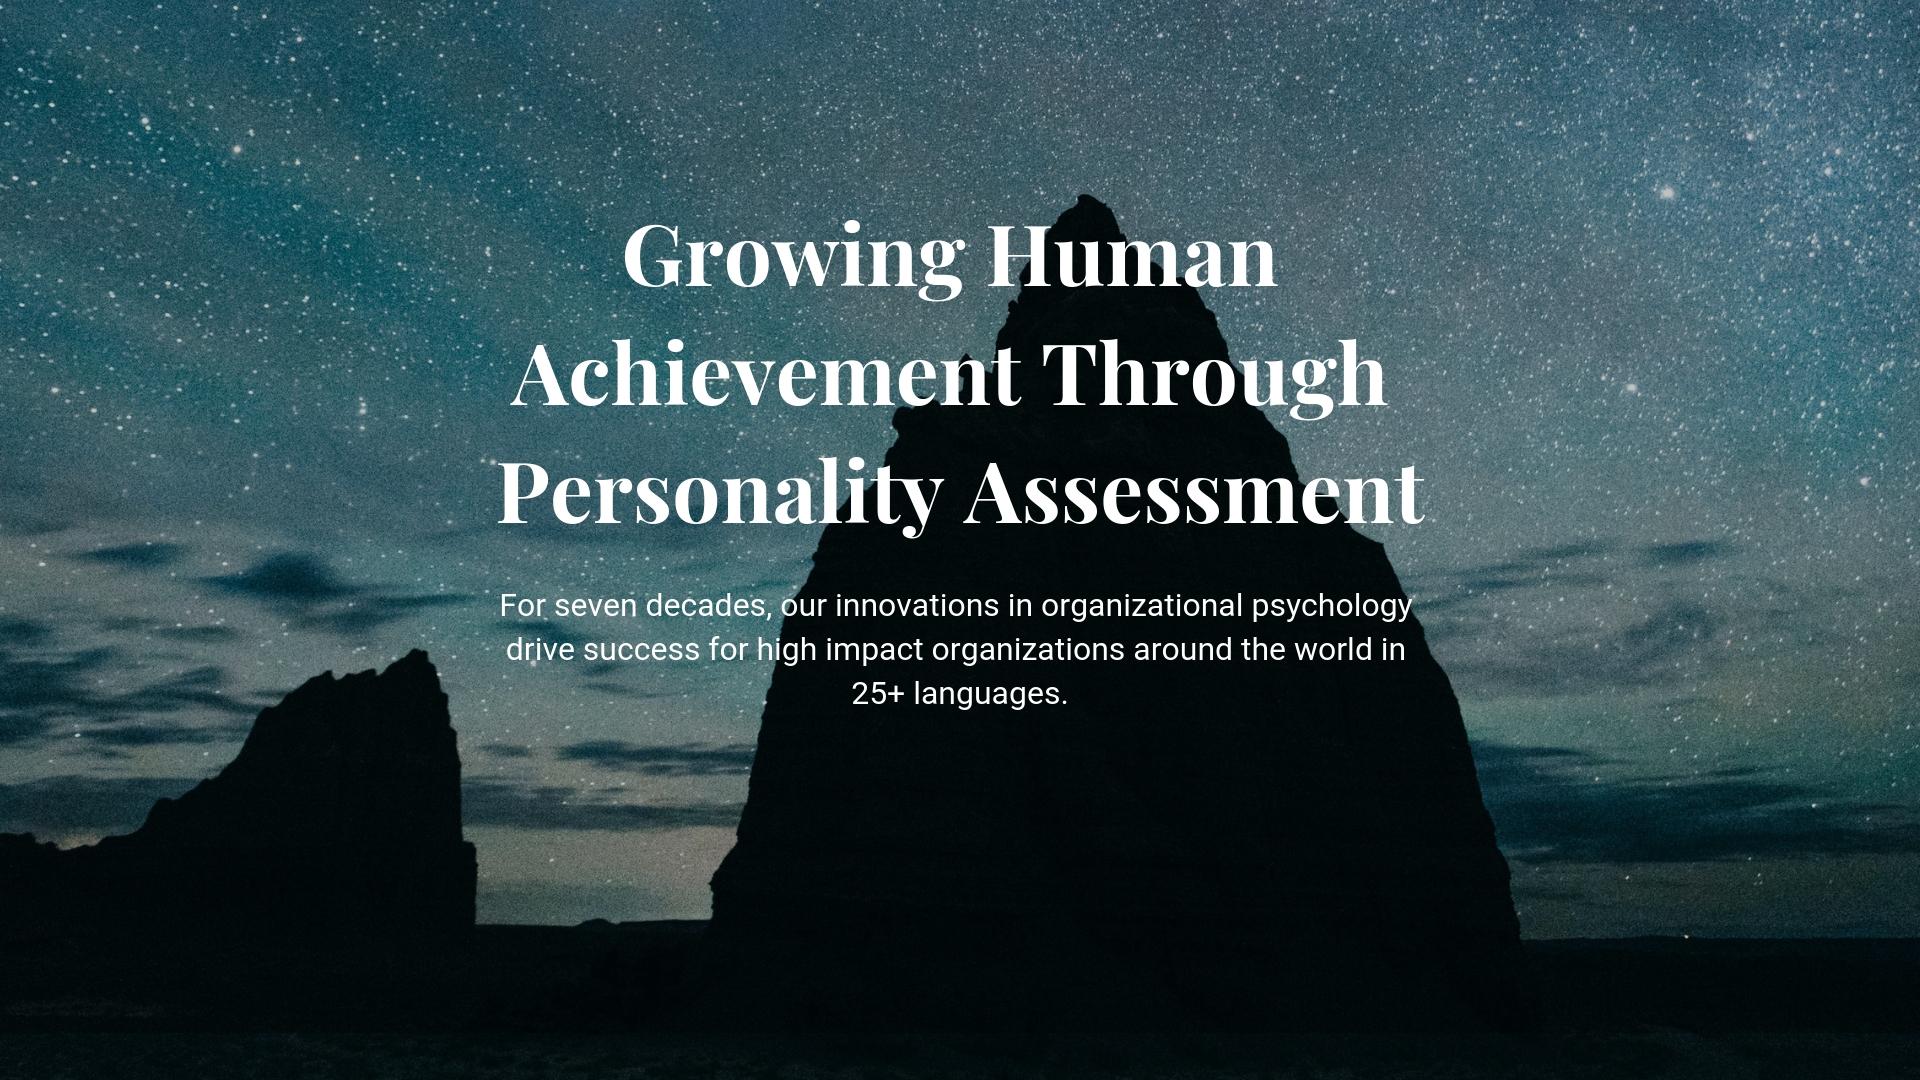 Growing Human Achiievement Through Personality Assessment (2)